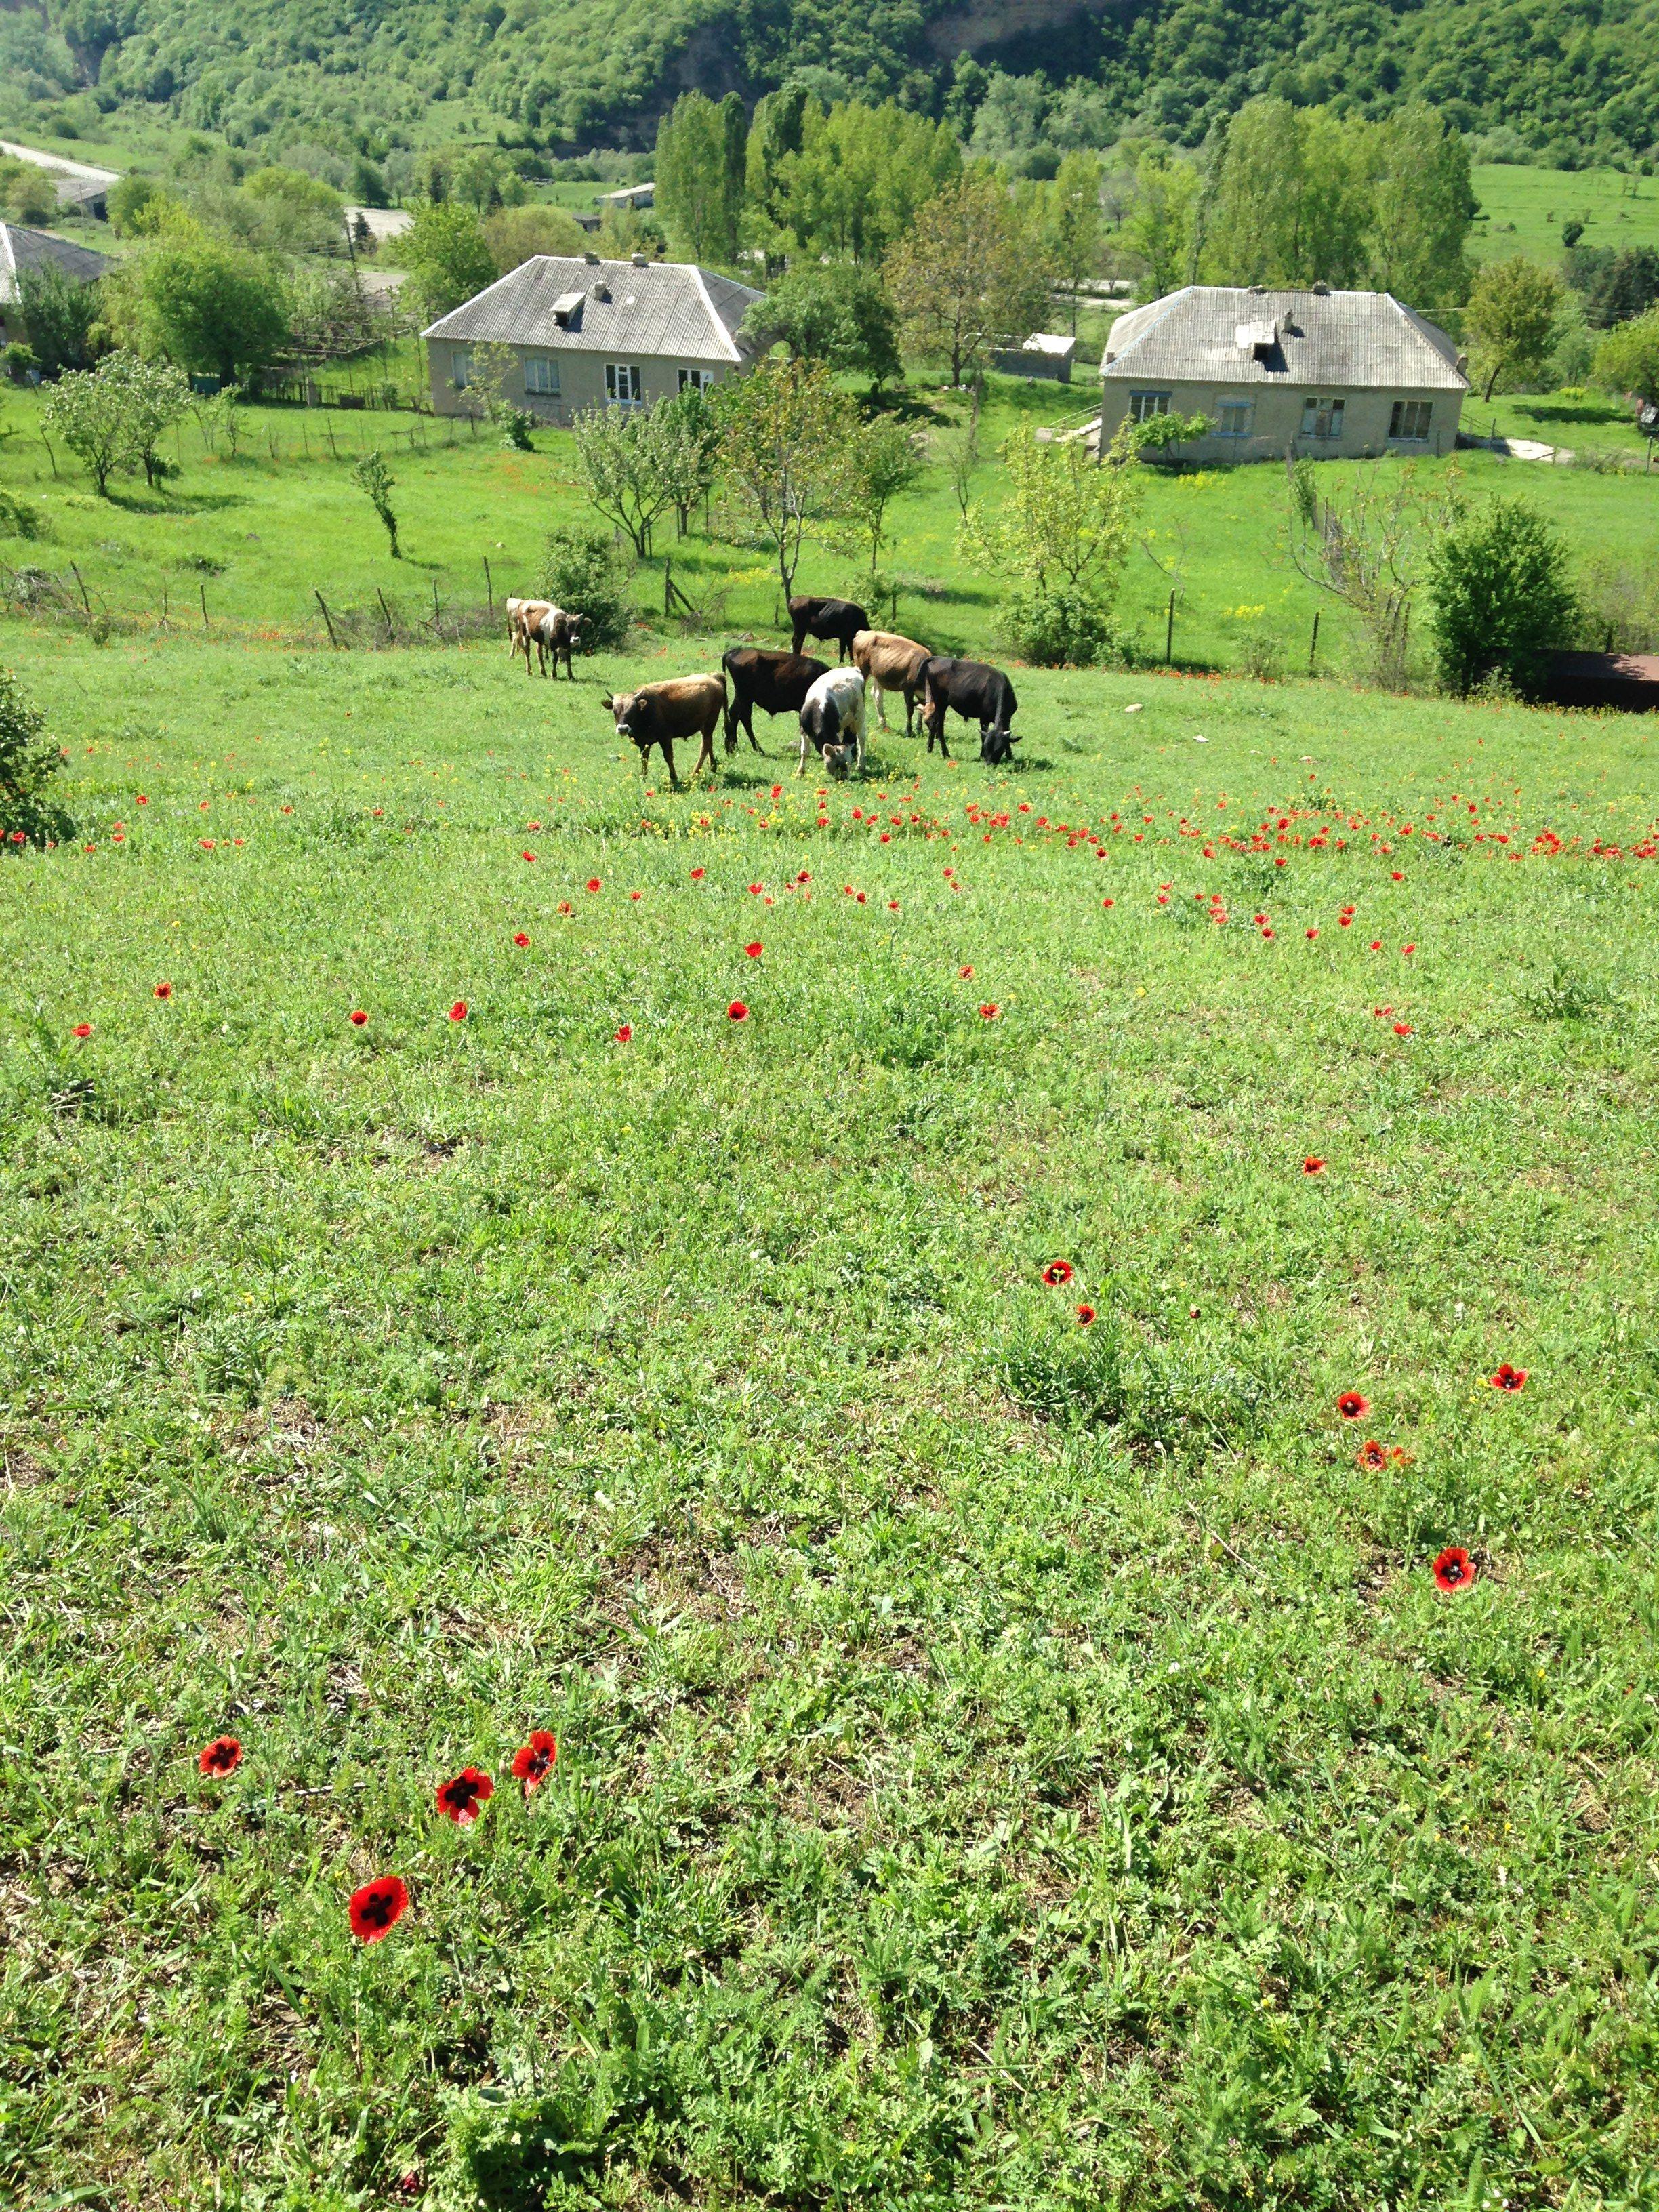 #Georgia#Village#Flovers#Cows#nature